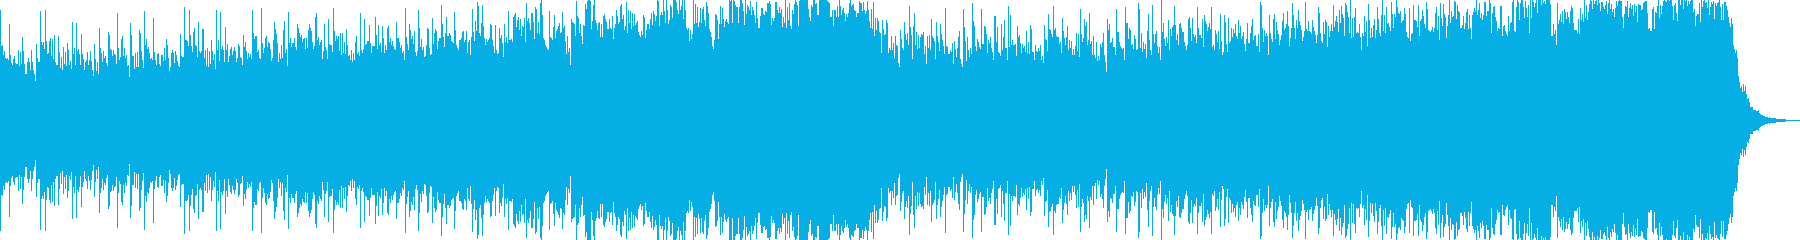 Prologue Orchestra 2の再生済みの波形